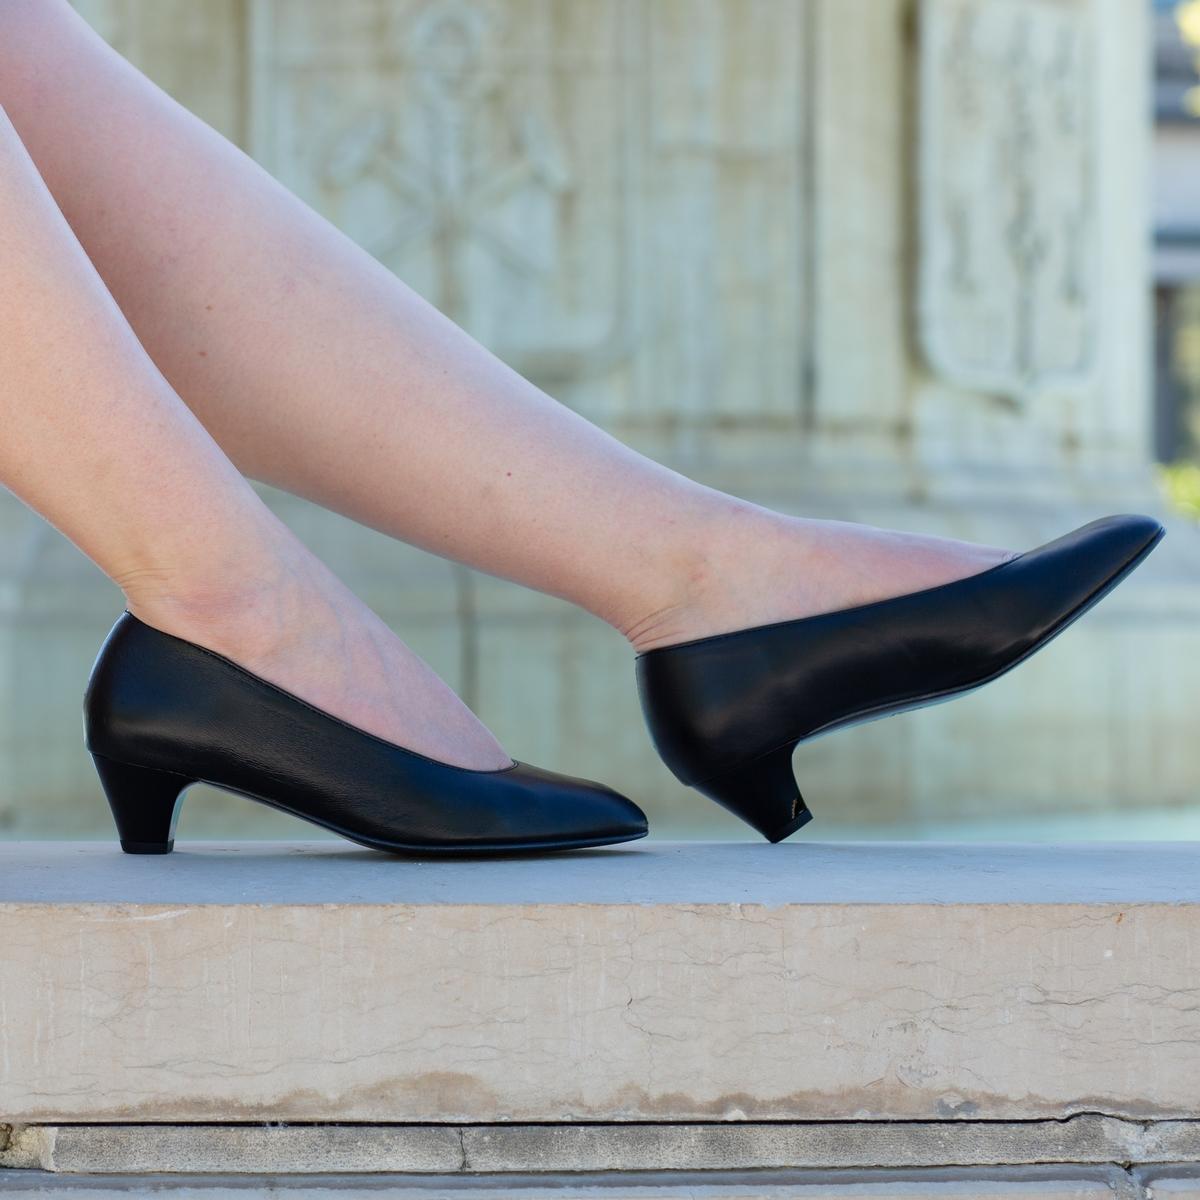 chaussures hallux valgus